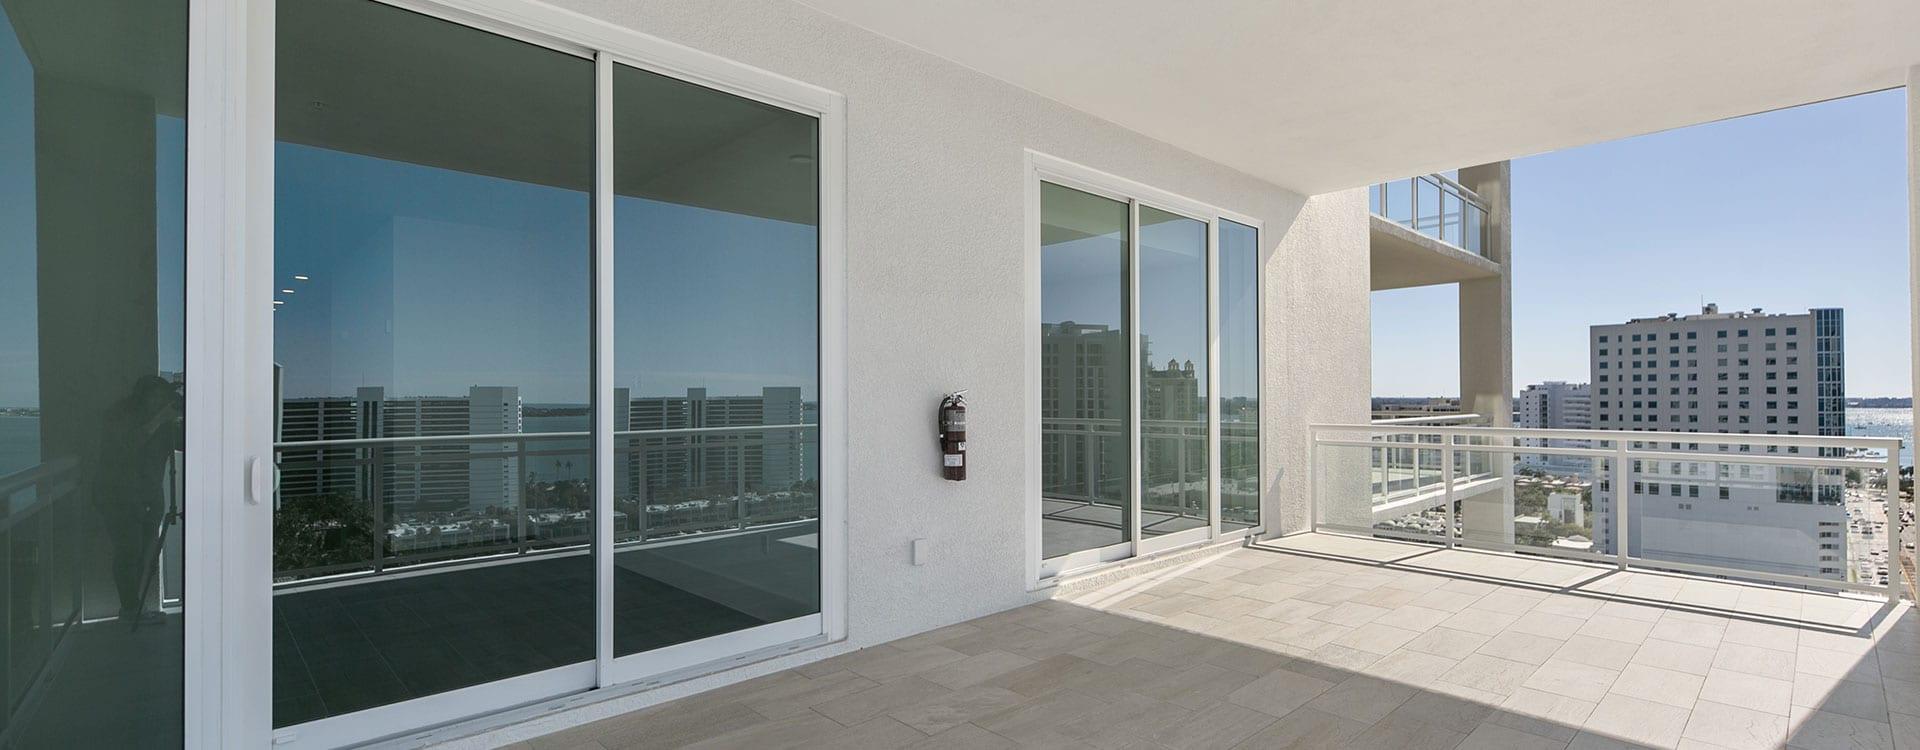 blvd sarasota residence 1503 terrace